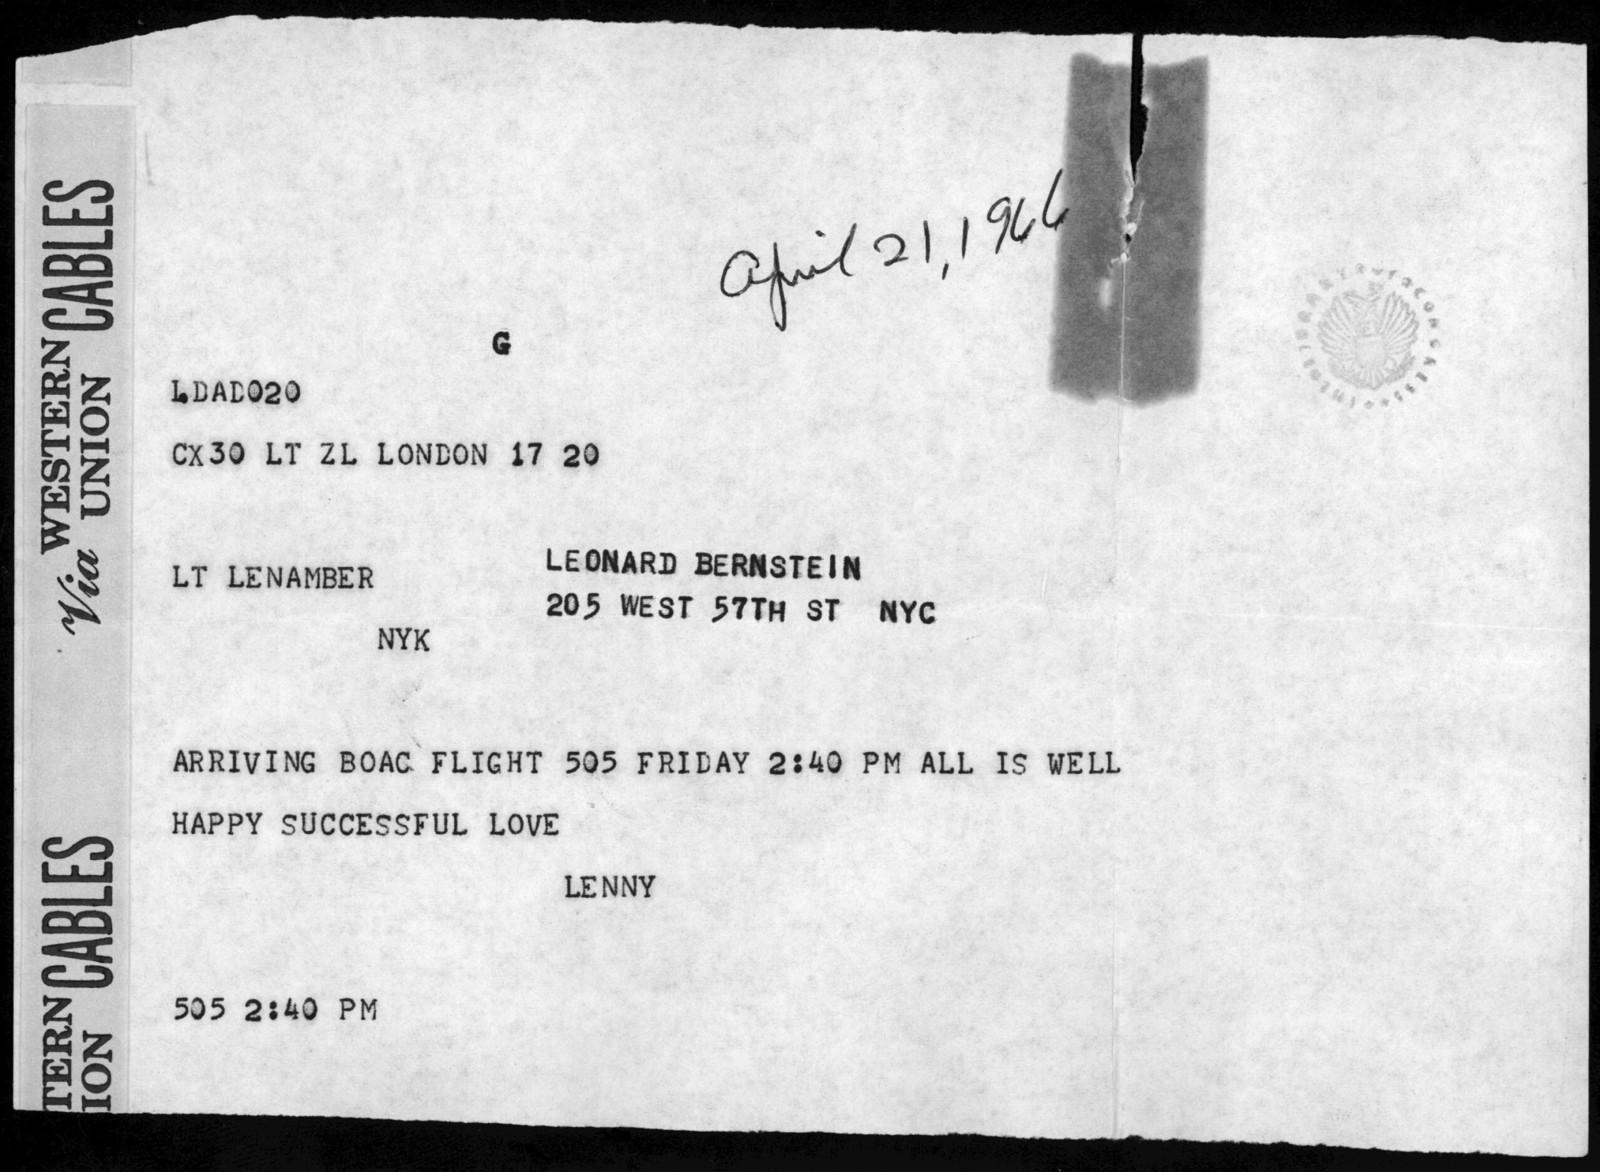 Letter from Leonard Bernstein to Helen Coates, April 21, 1966